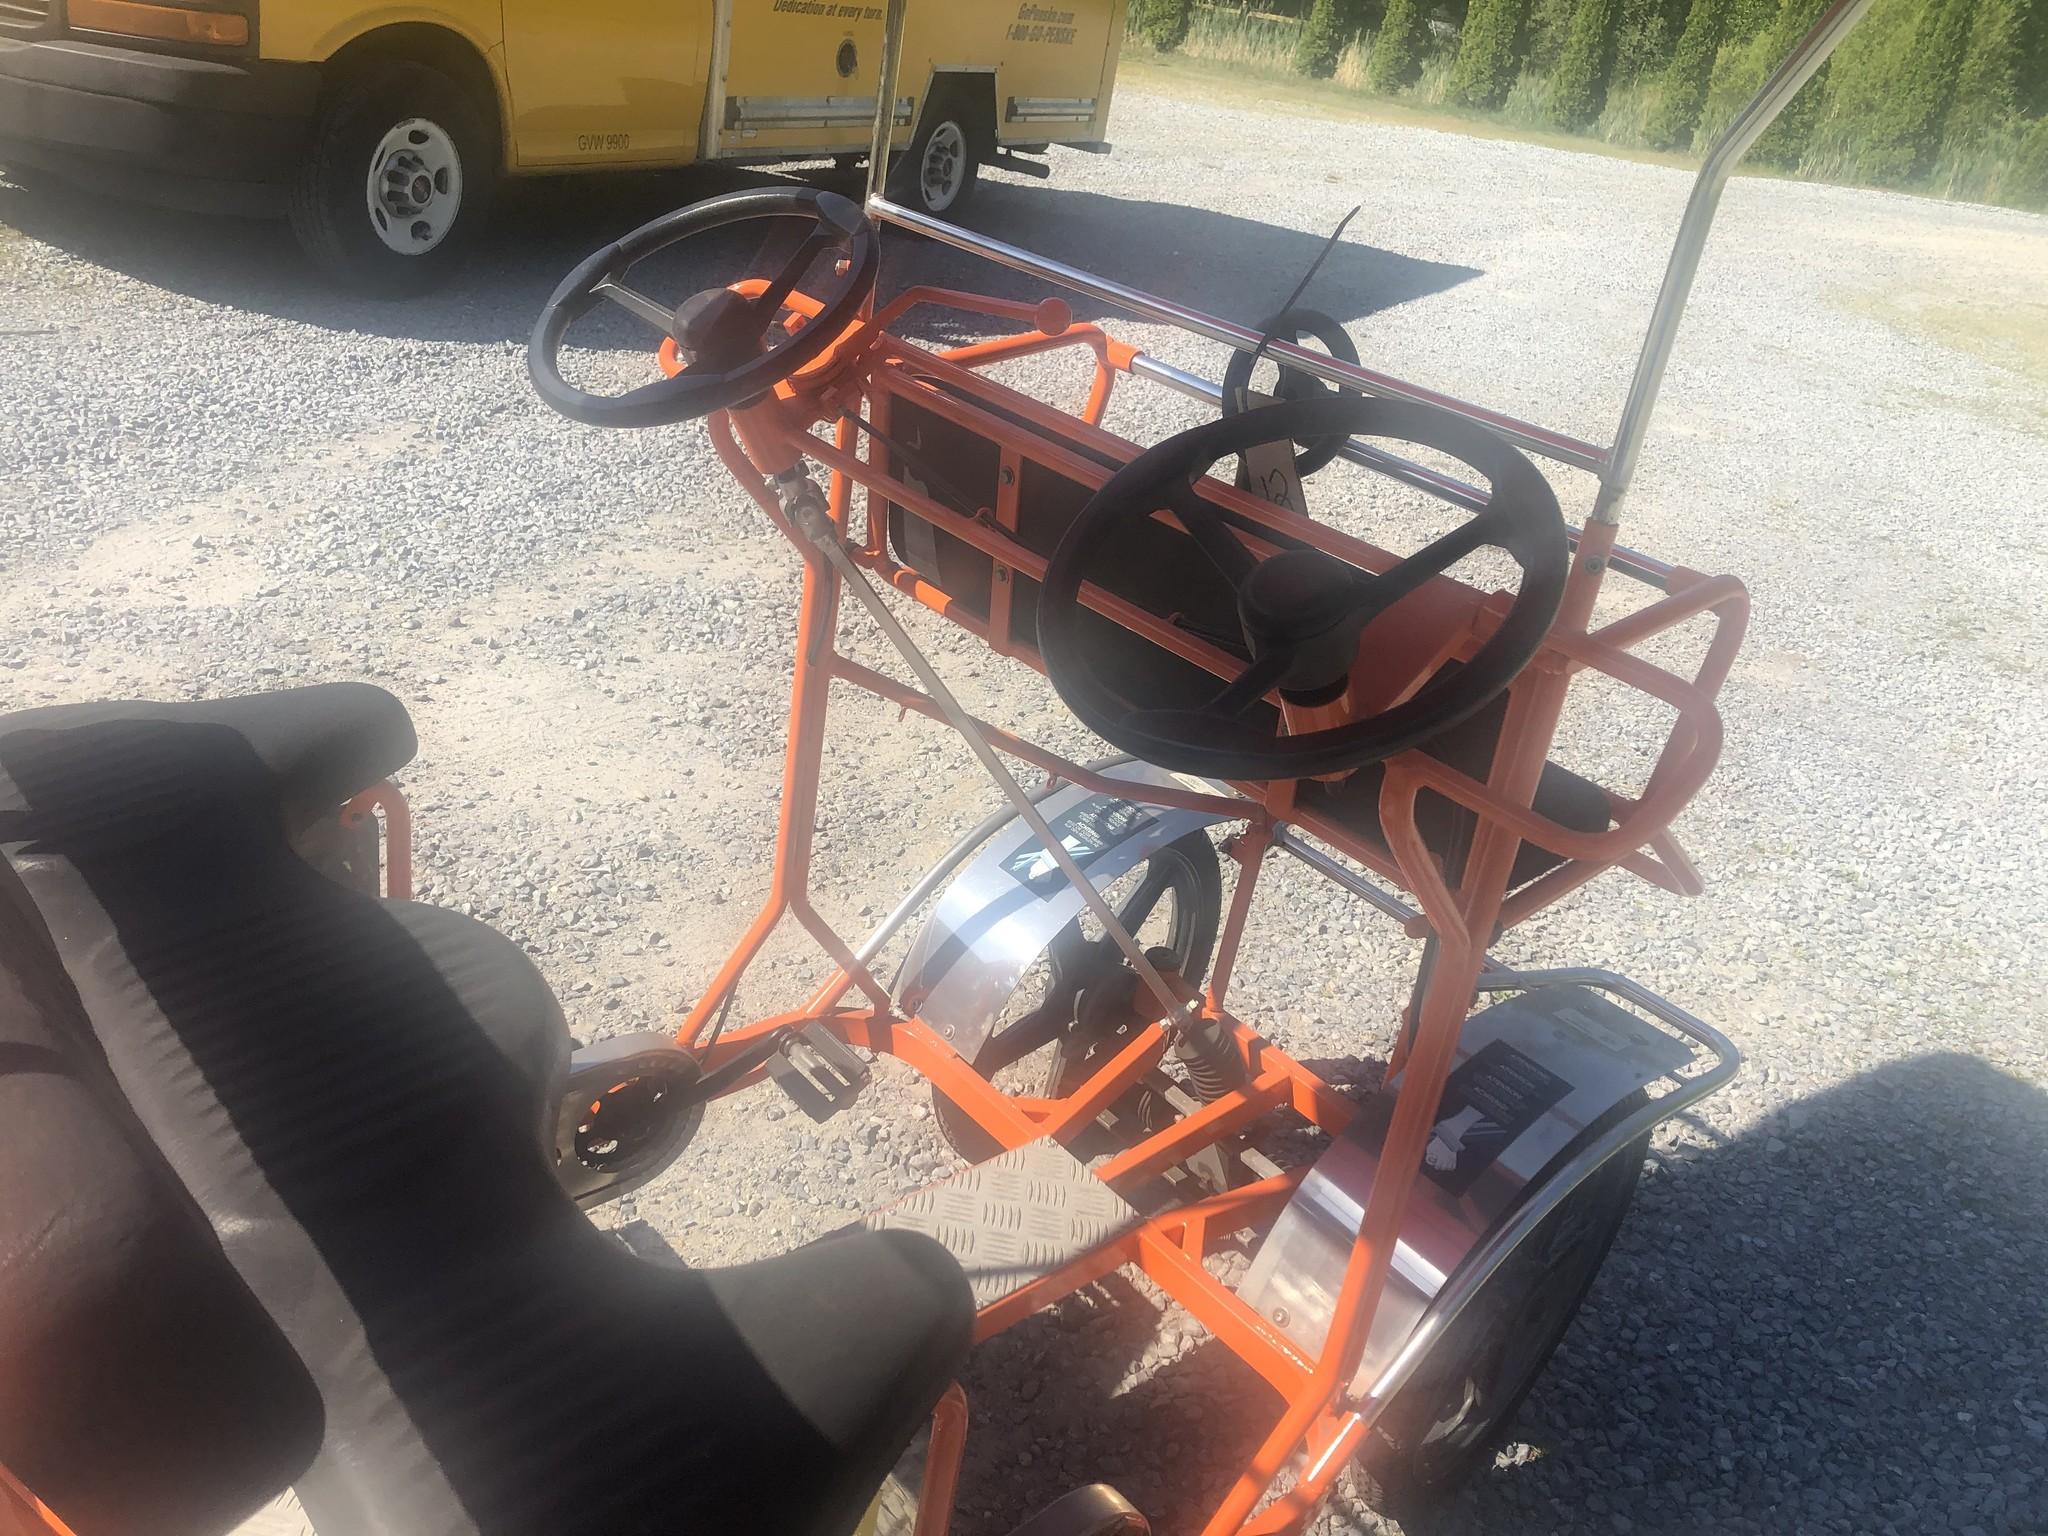 Refurbished Used NewTecnoArt Selene Sport Surrey Bike (Orange w/ Red Top)